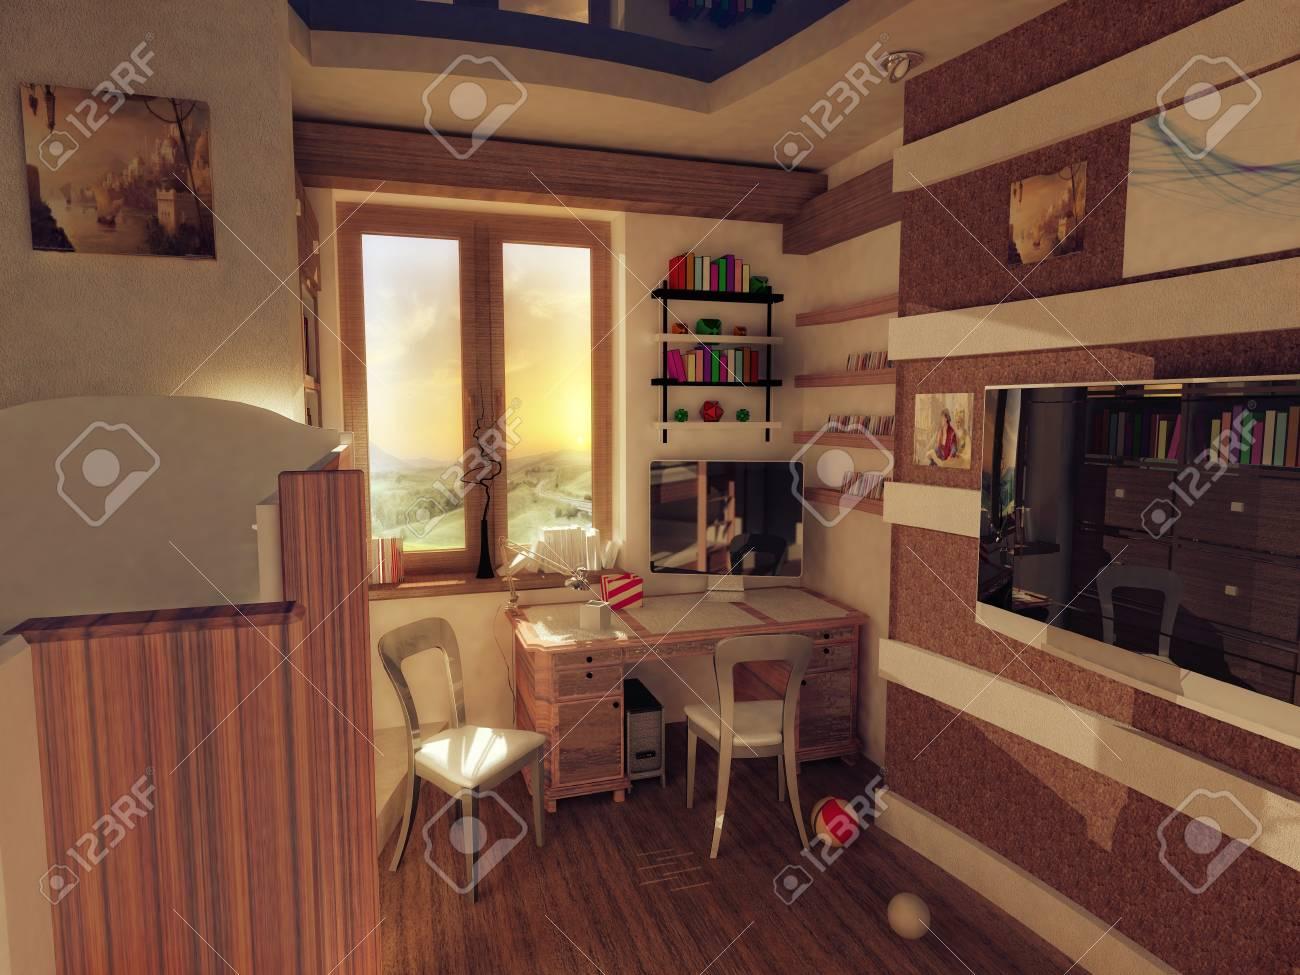 the interior of children s rooms Stock Photo - 15430215